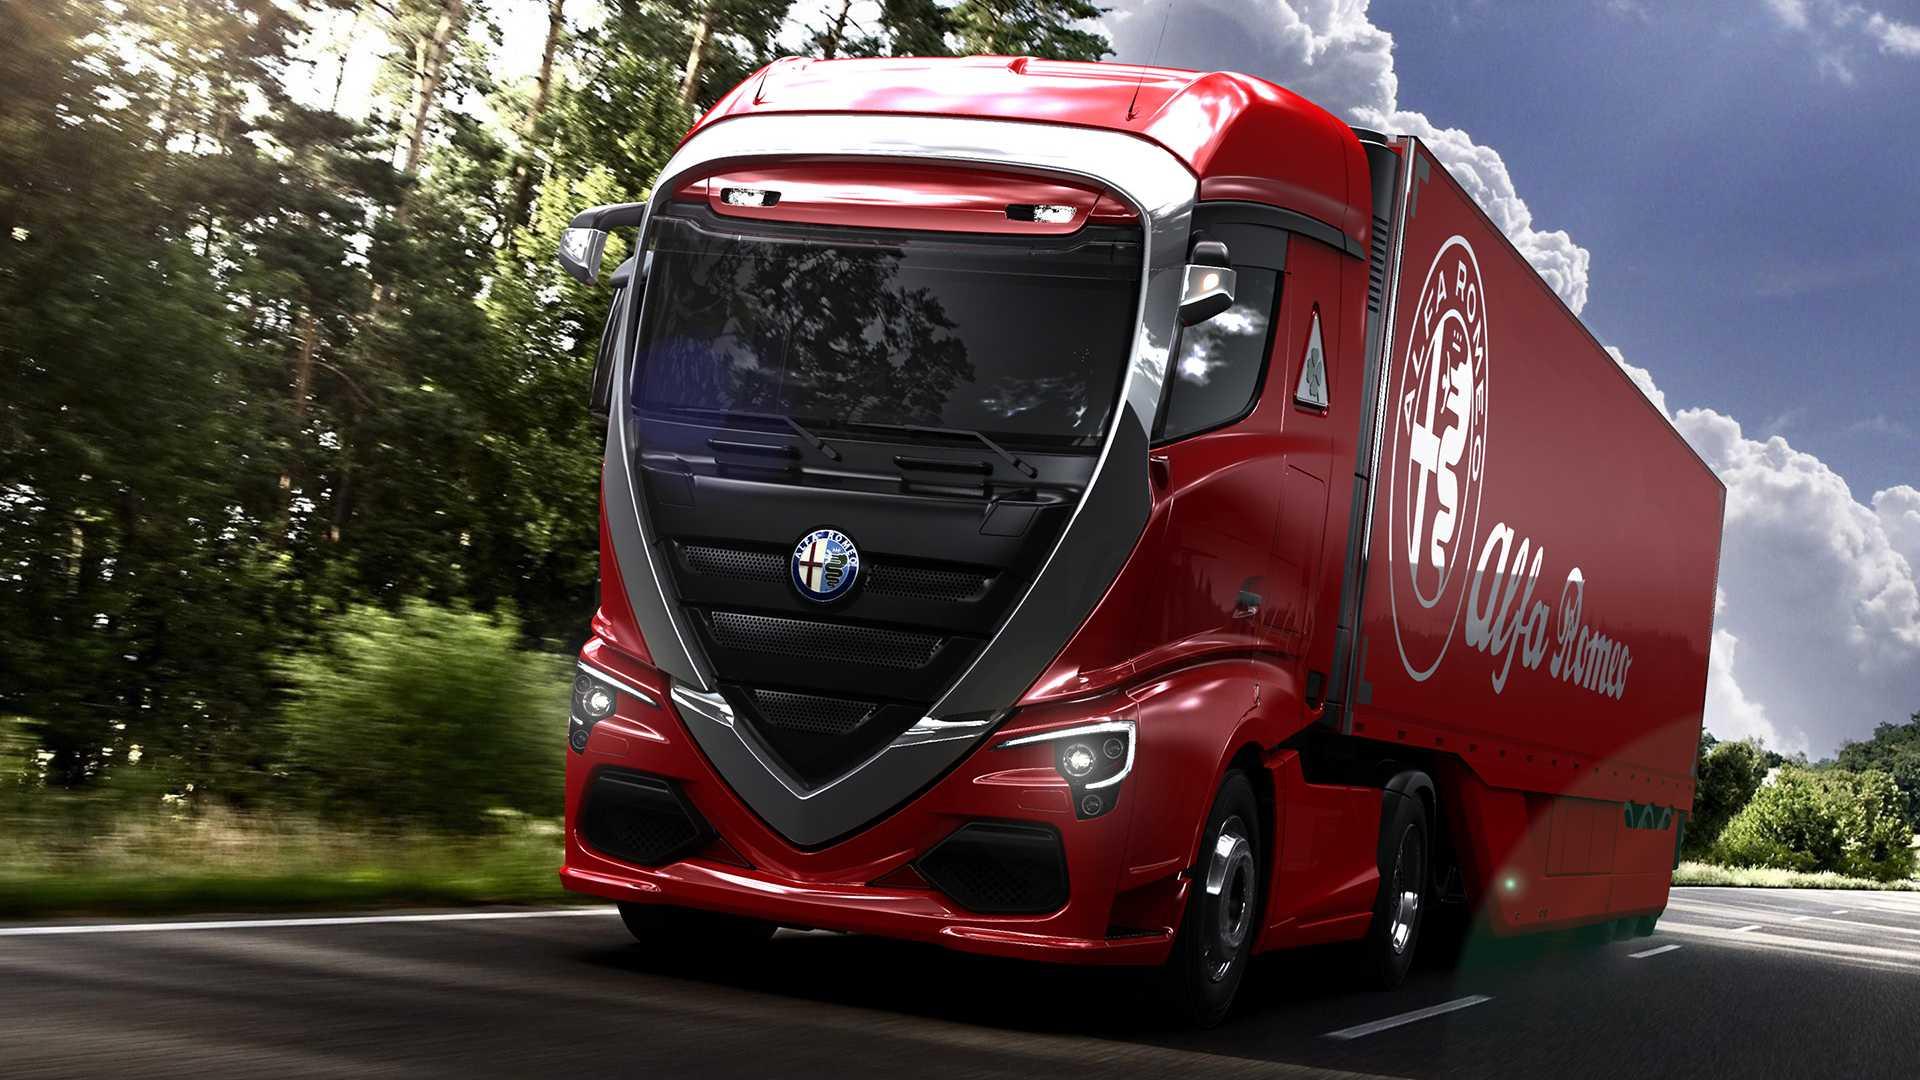 Šta ako Alfa Romeo predstavi kamion? - Auto Republika